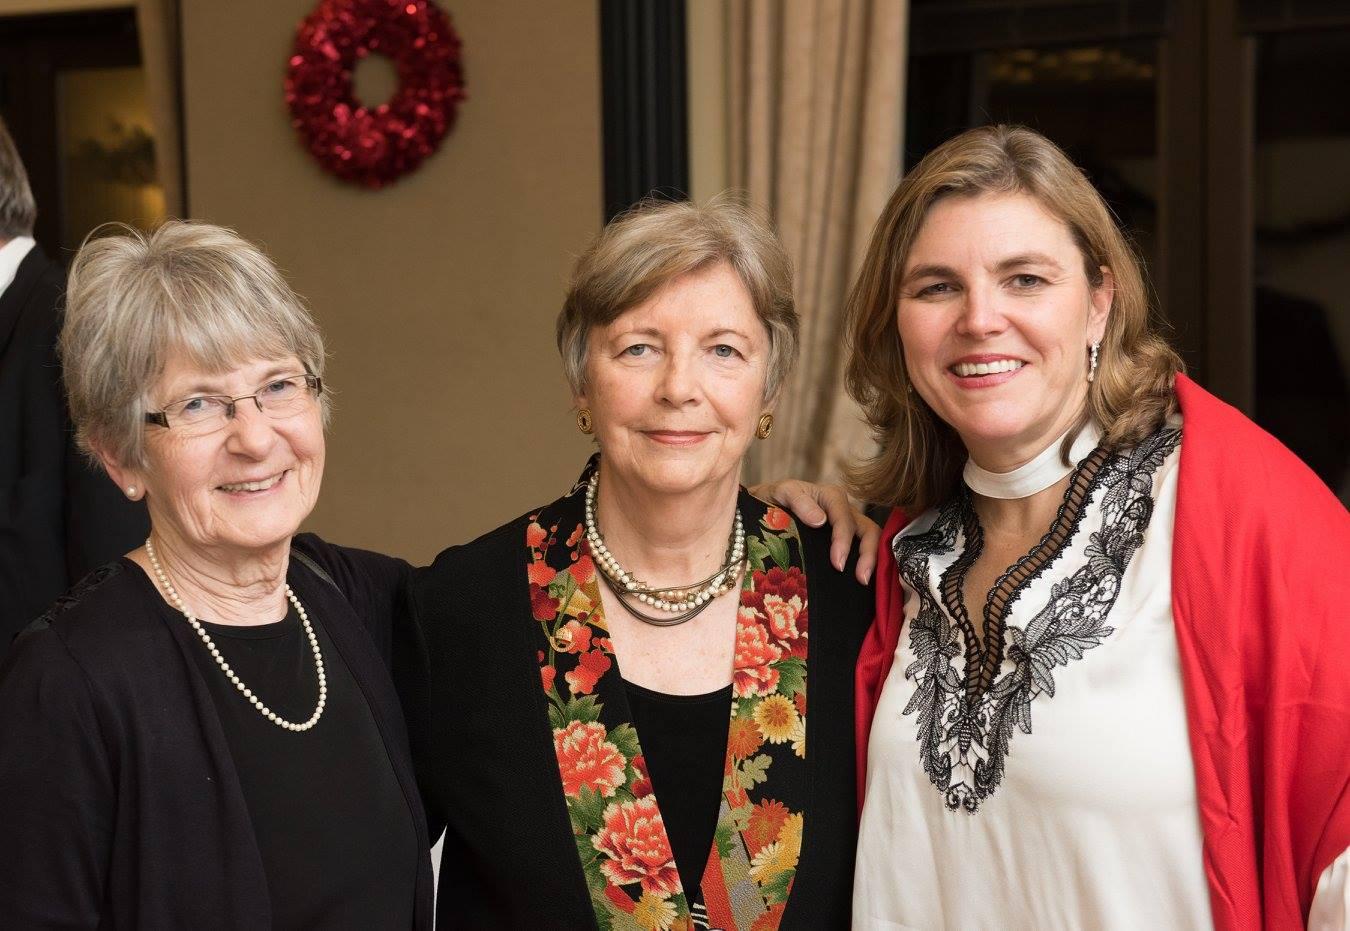 Mrs. Éva Kovács, Coalition Chair Emerita Mrs. Edith K. Lauer, Coalition President Mrs. Andrea Lauer Rice